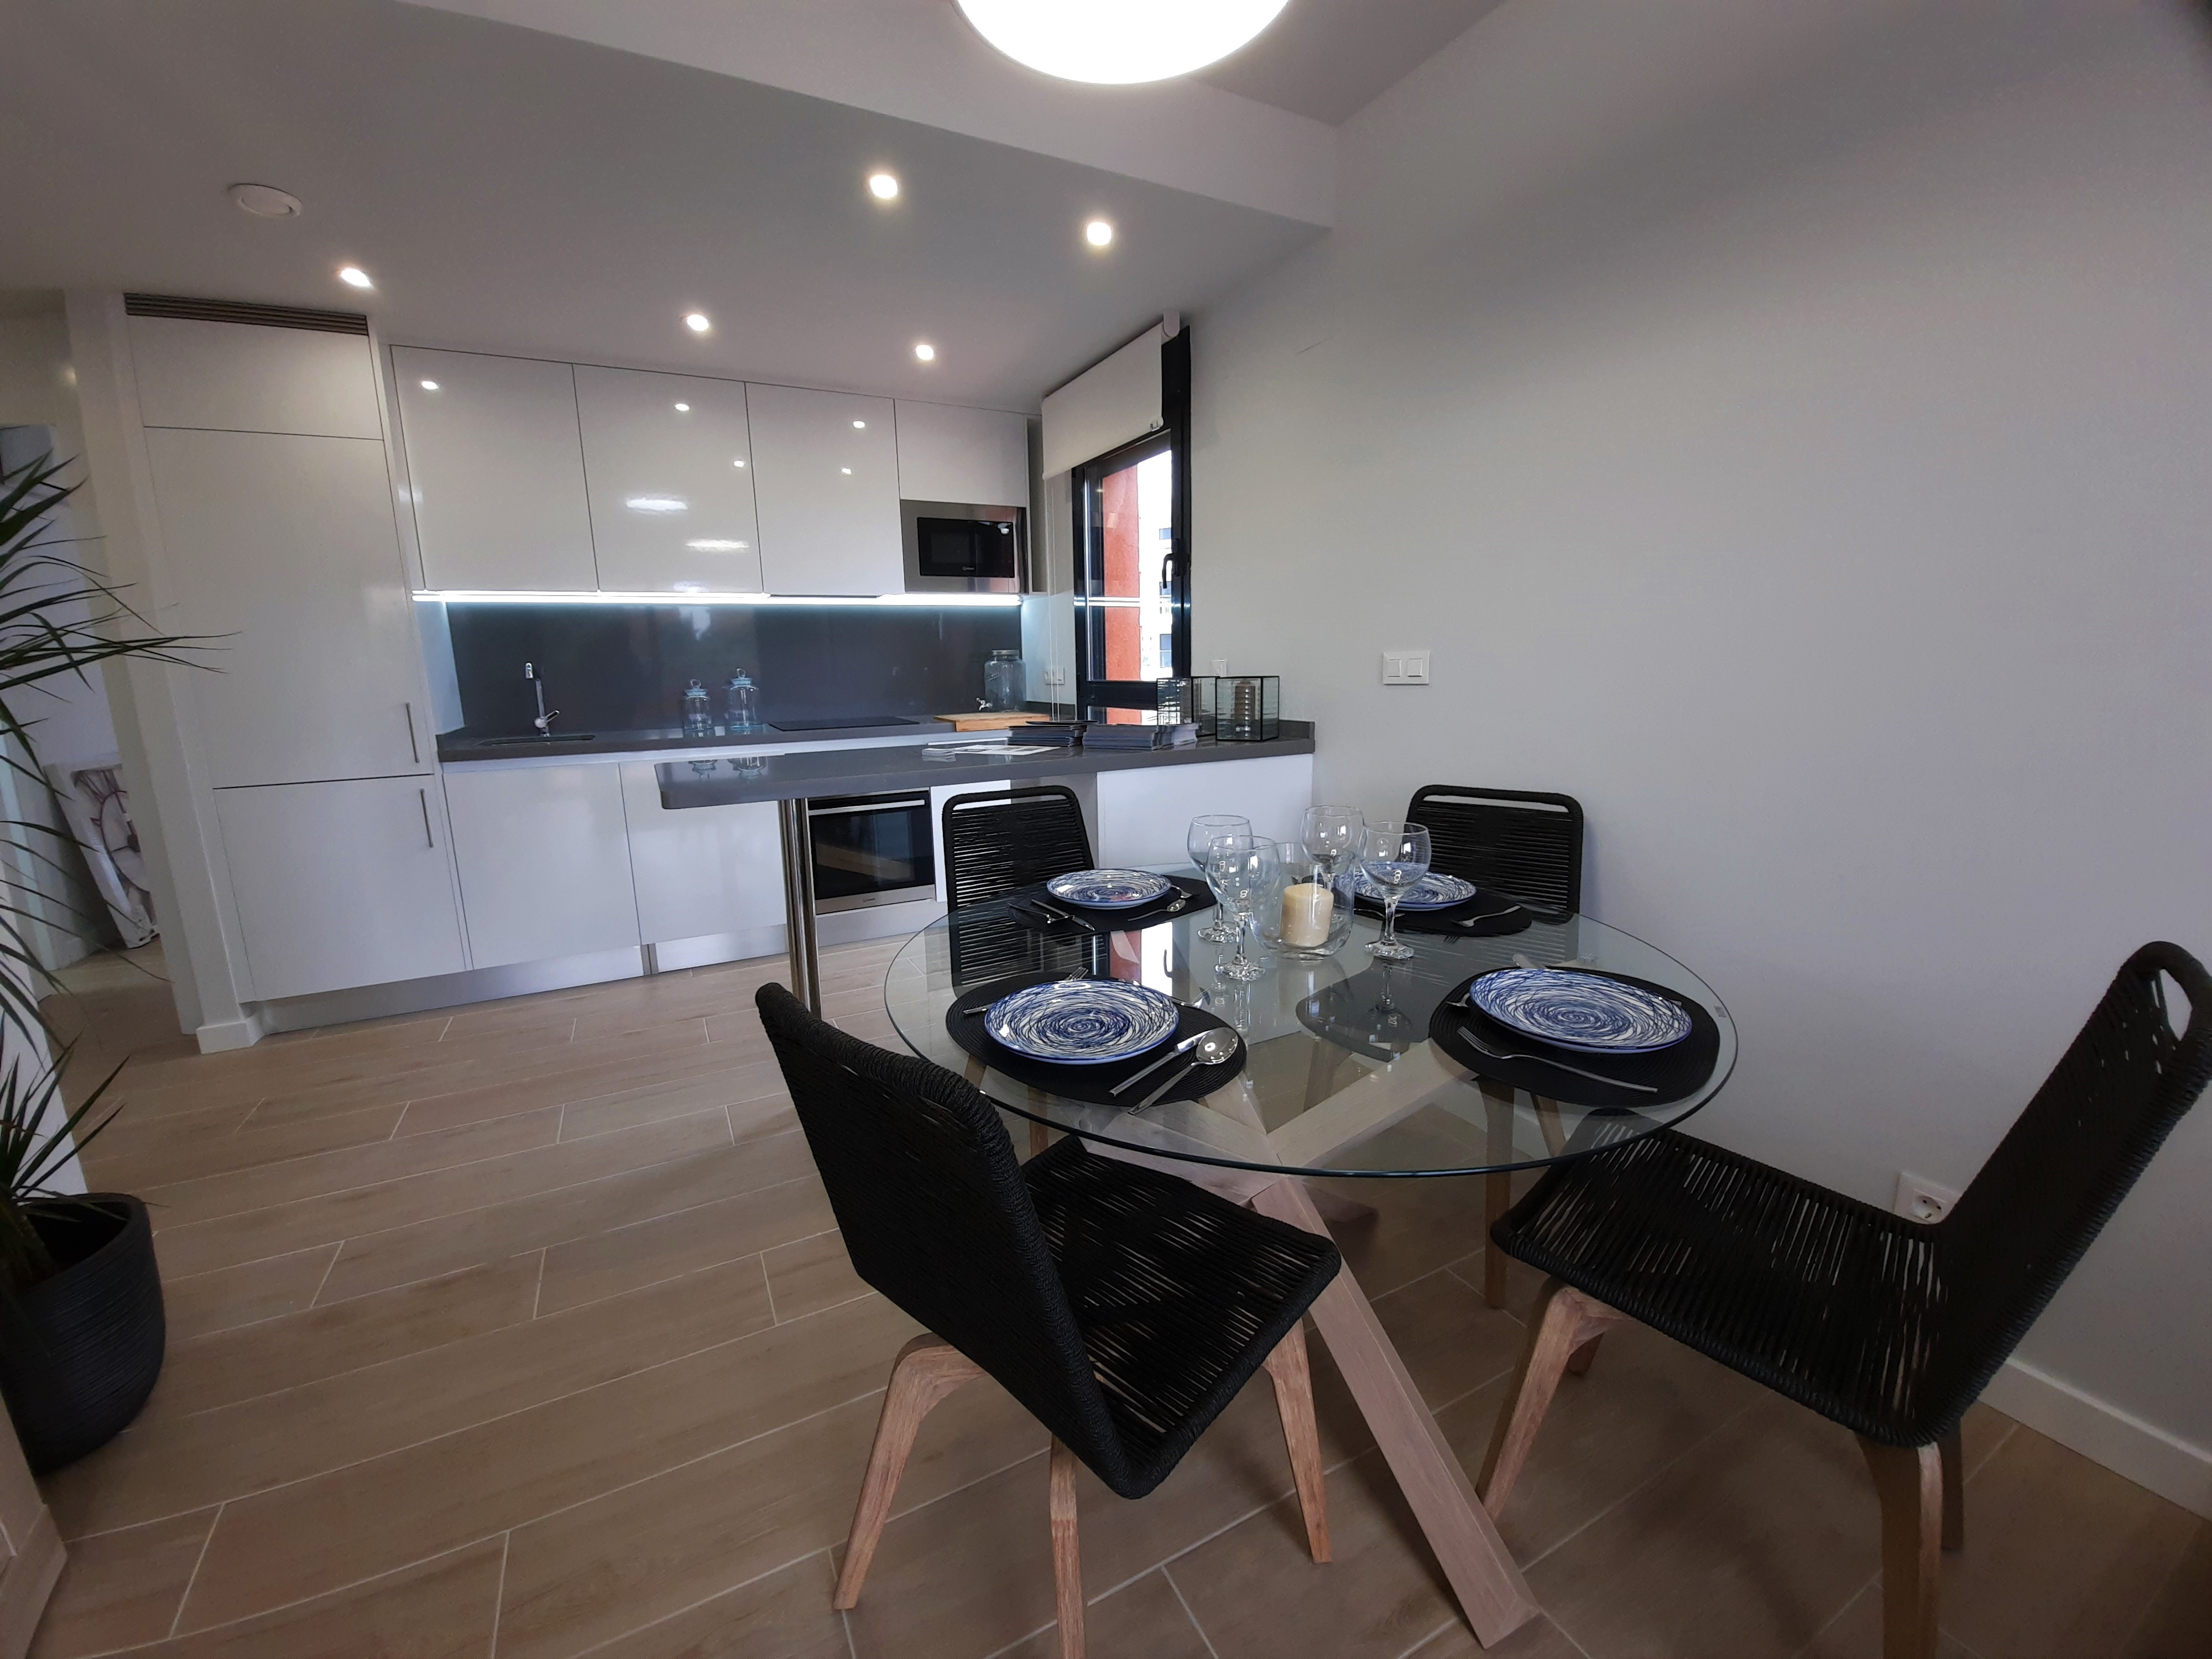 kf943558: Apartment for sale in Villamartin